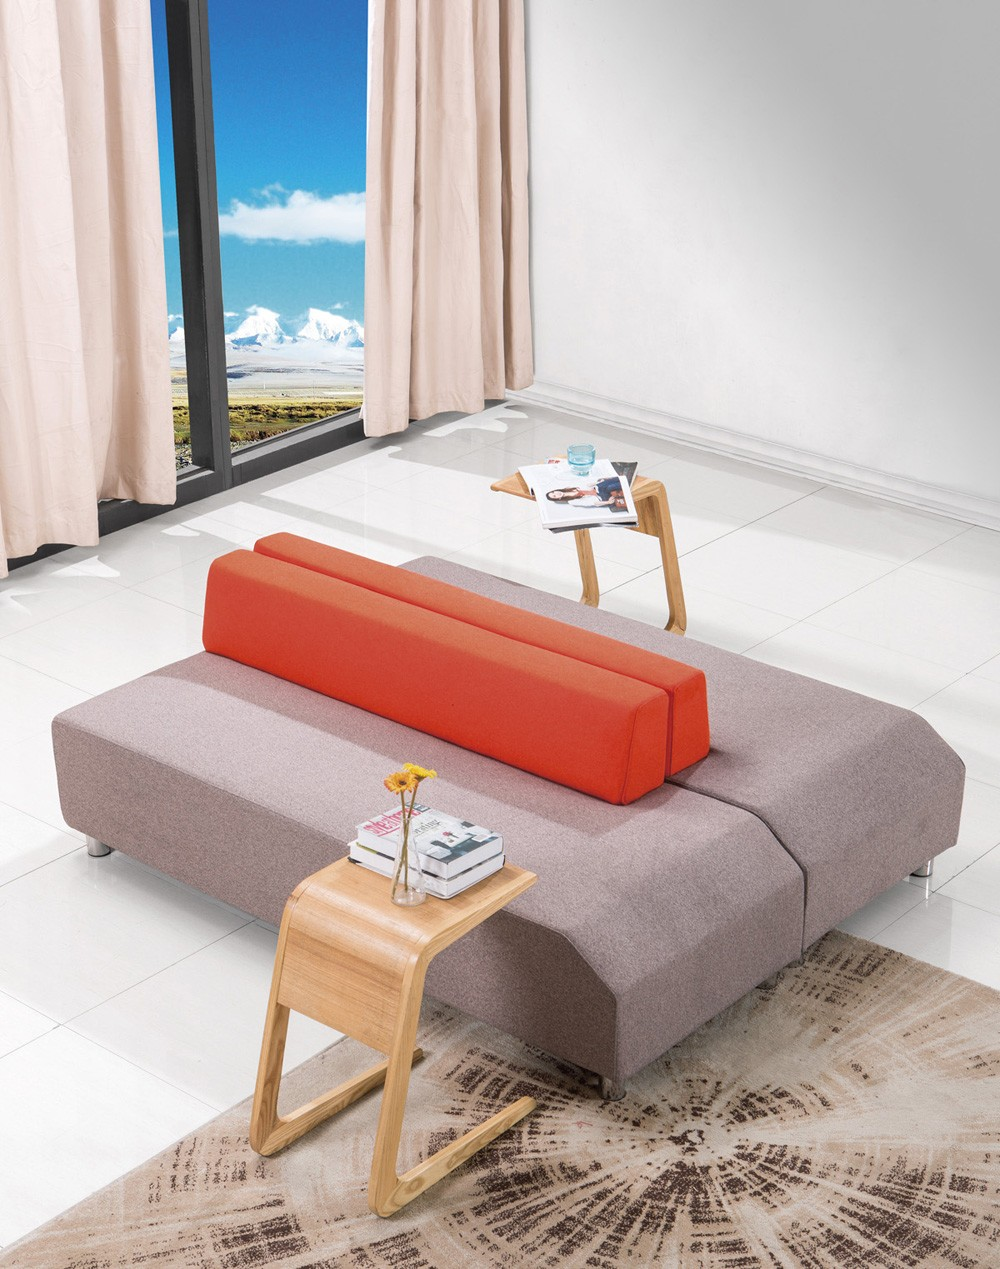 Buy Recliner Za House Of Motani Recliner Motion Furniture